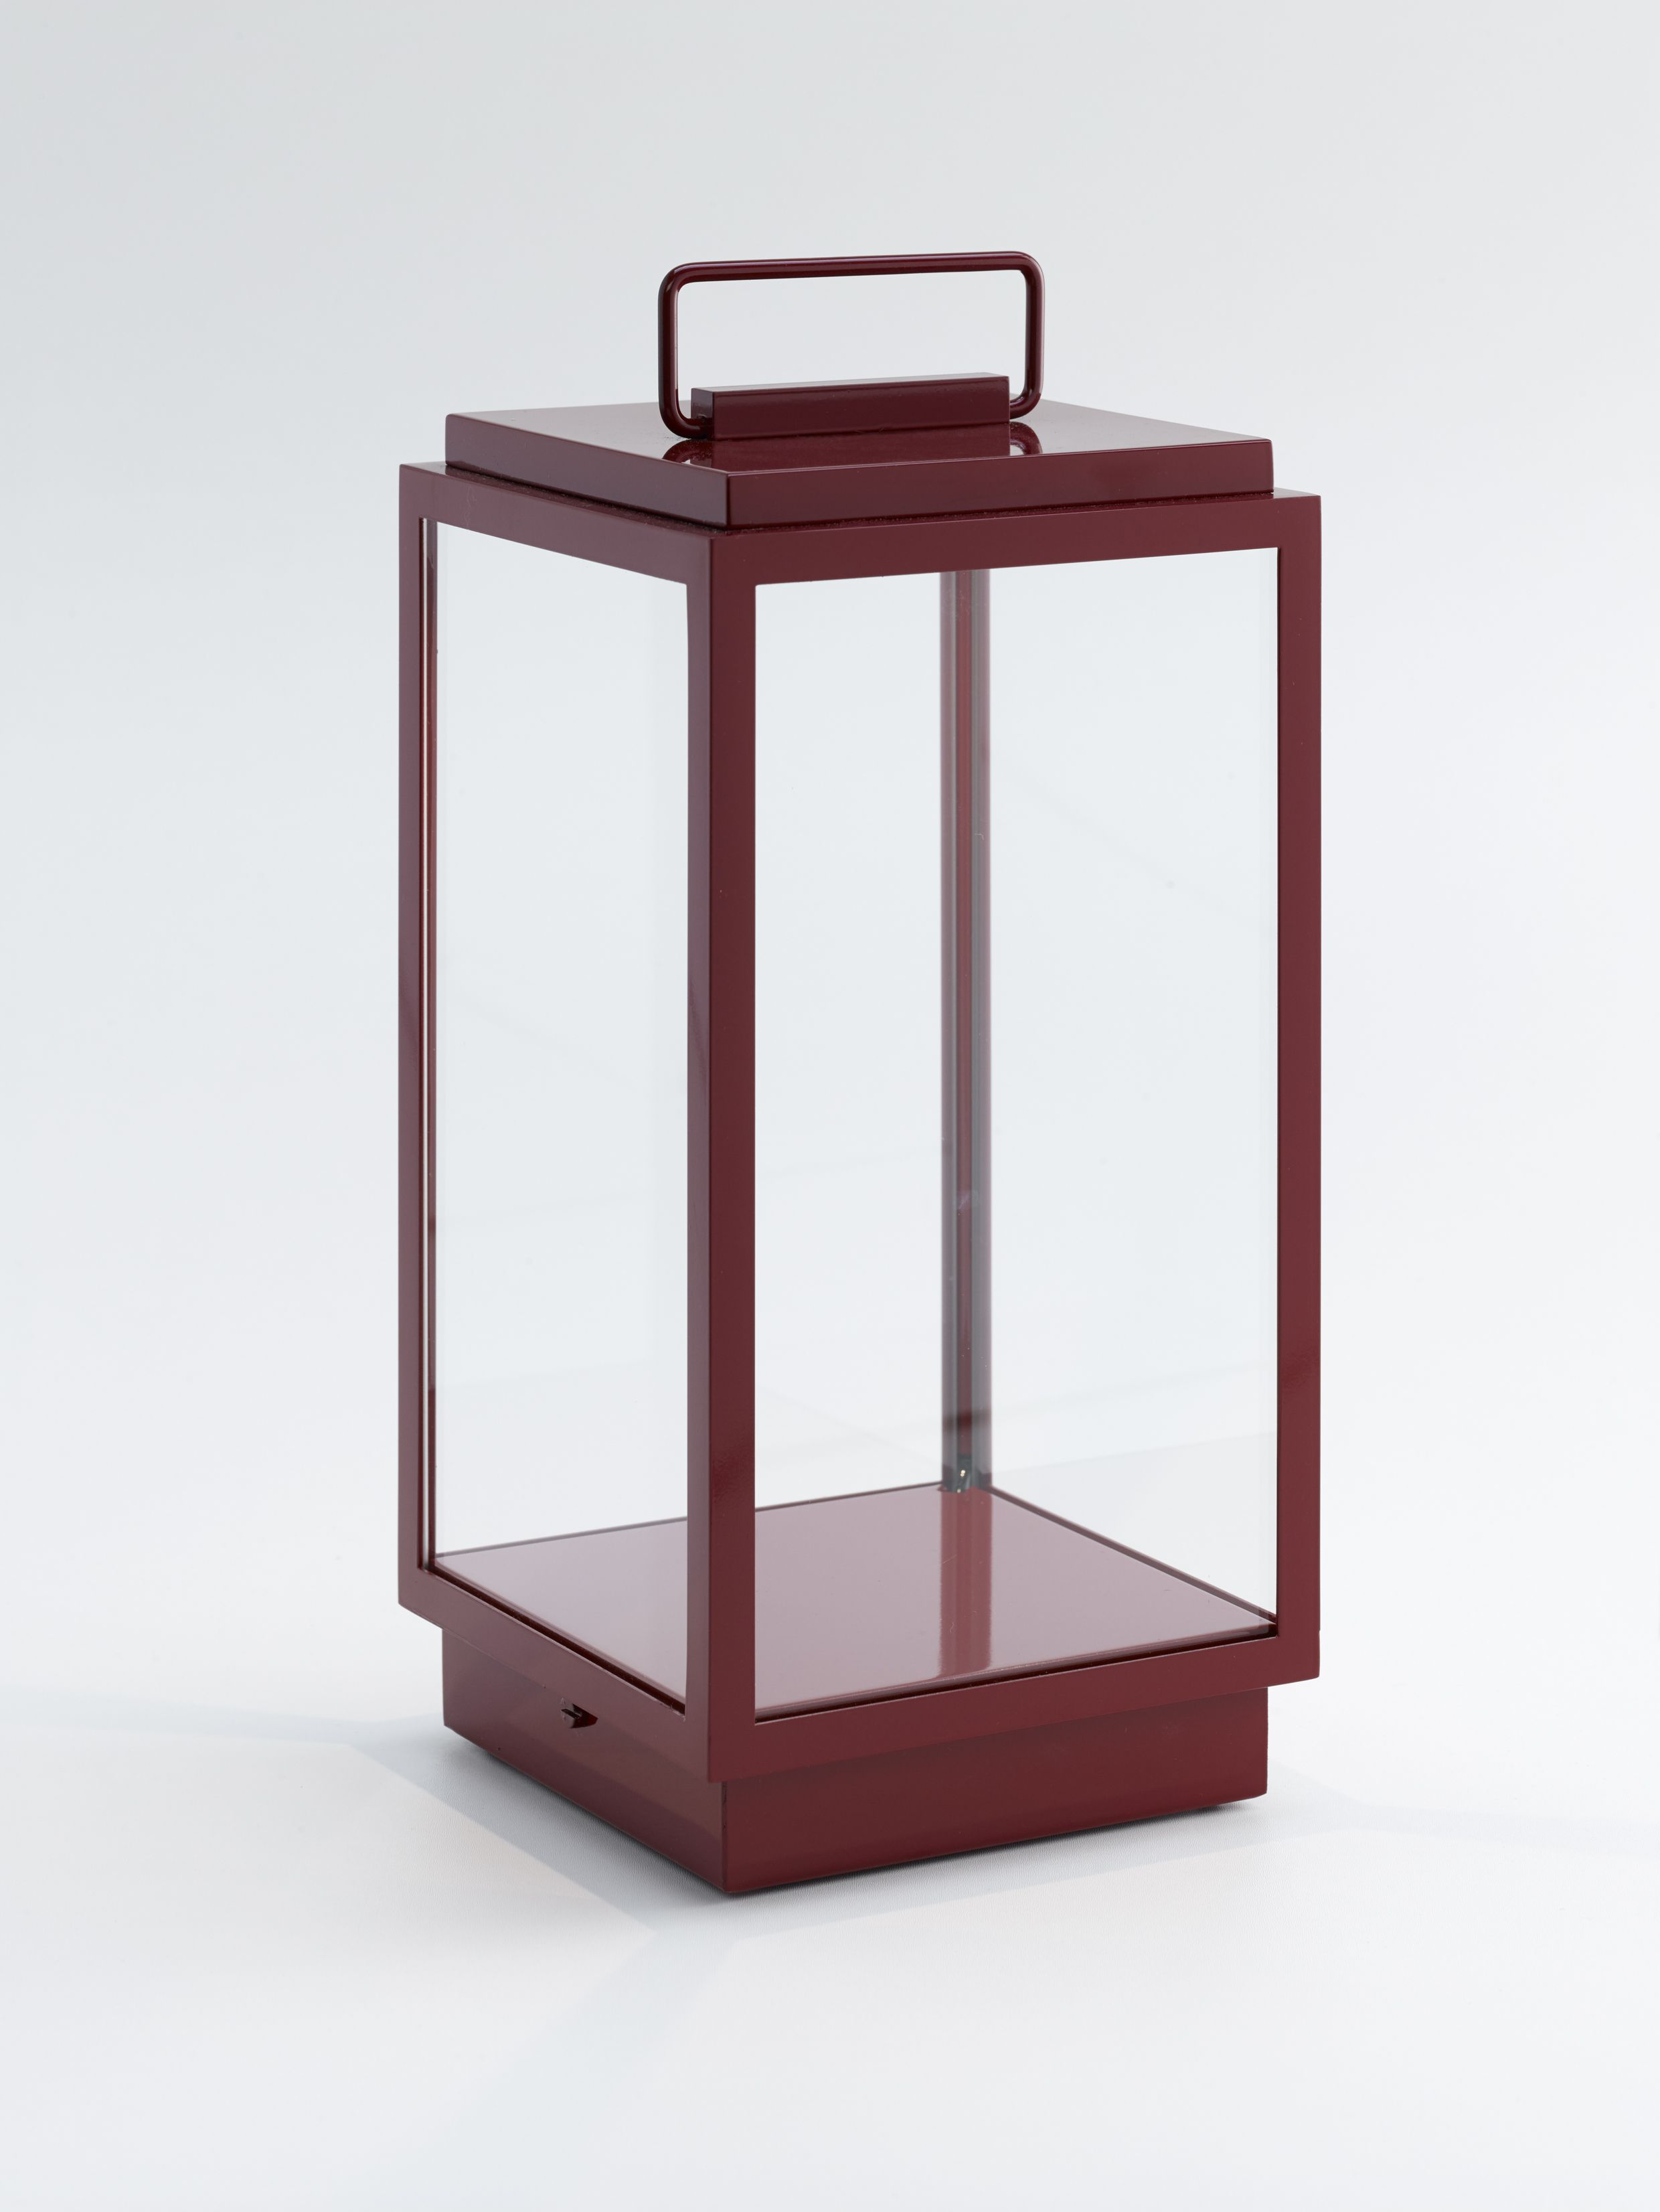 TEKNA presents Nautic | Blakes Table Lamp in Kenia Red